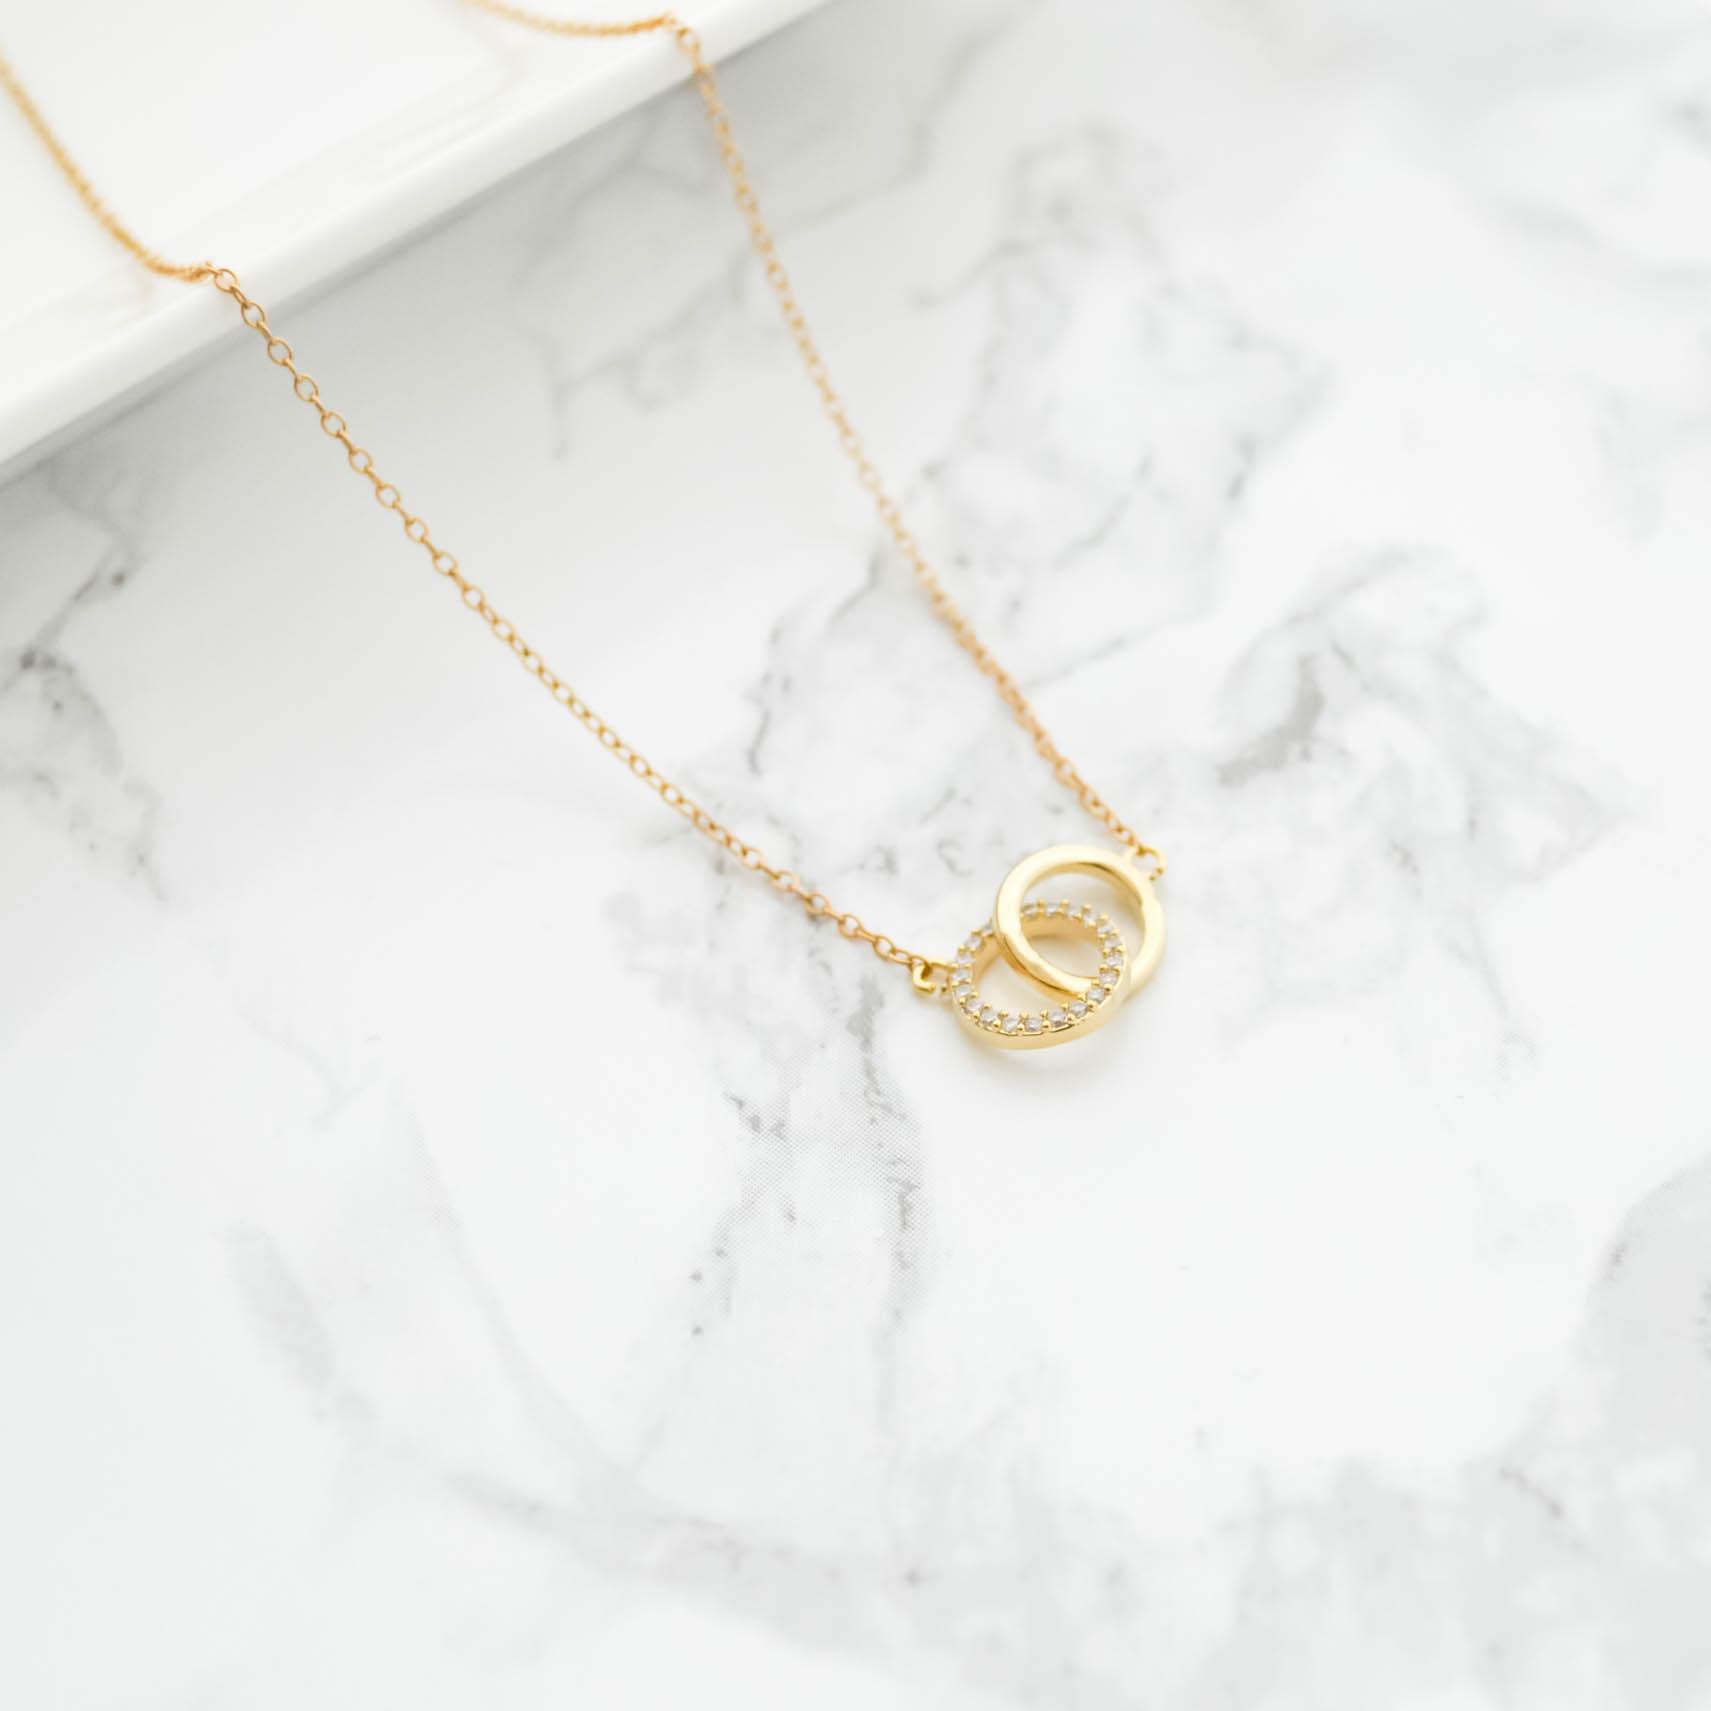 14kgf Double Circle Zirconia Necklace